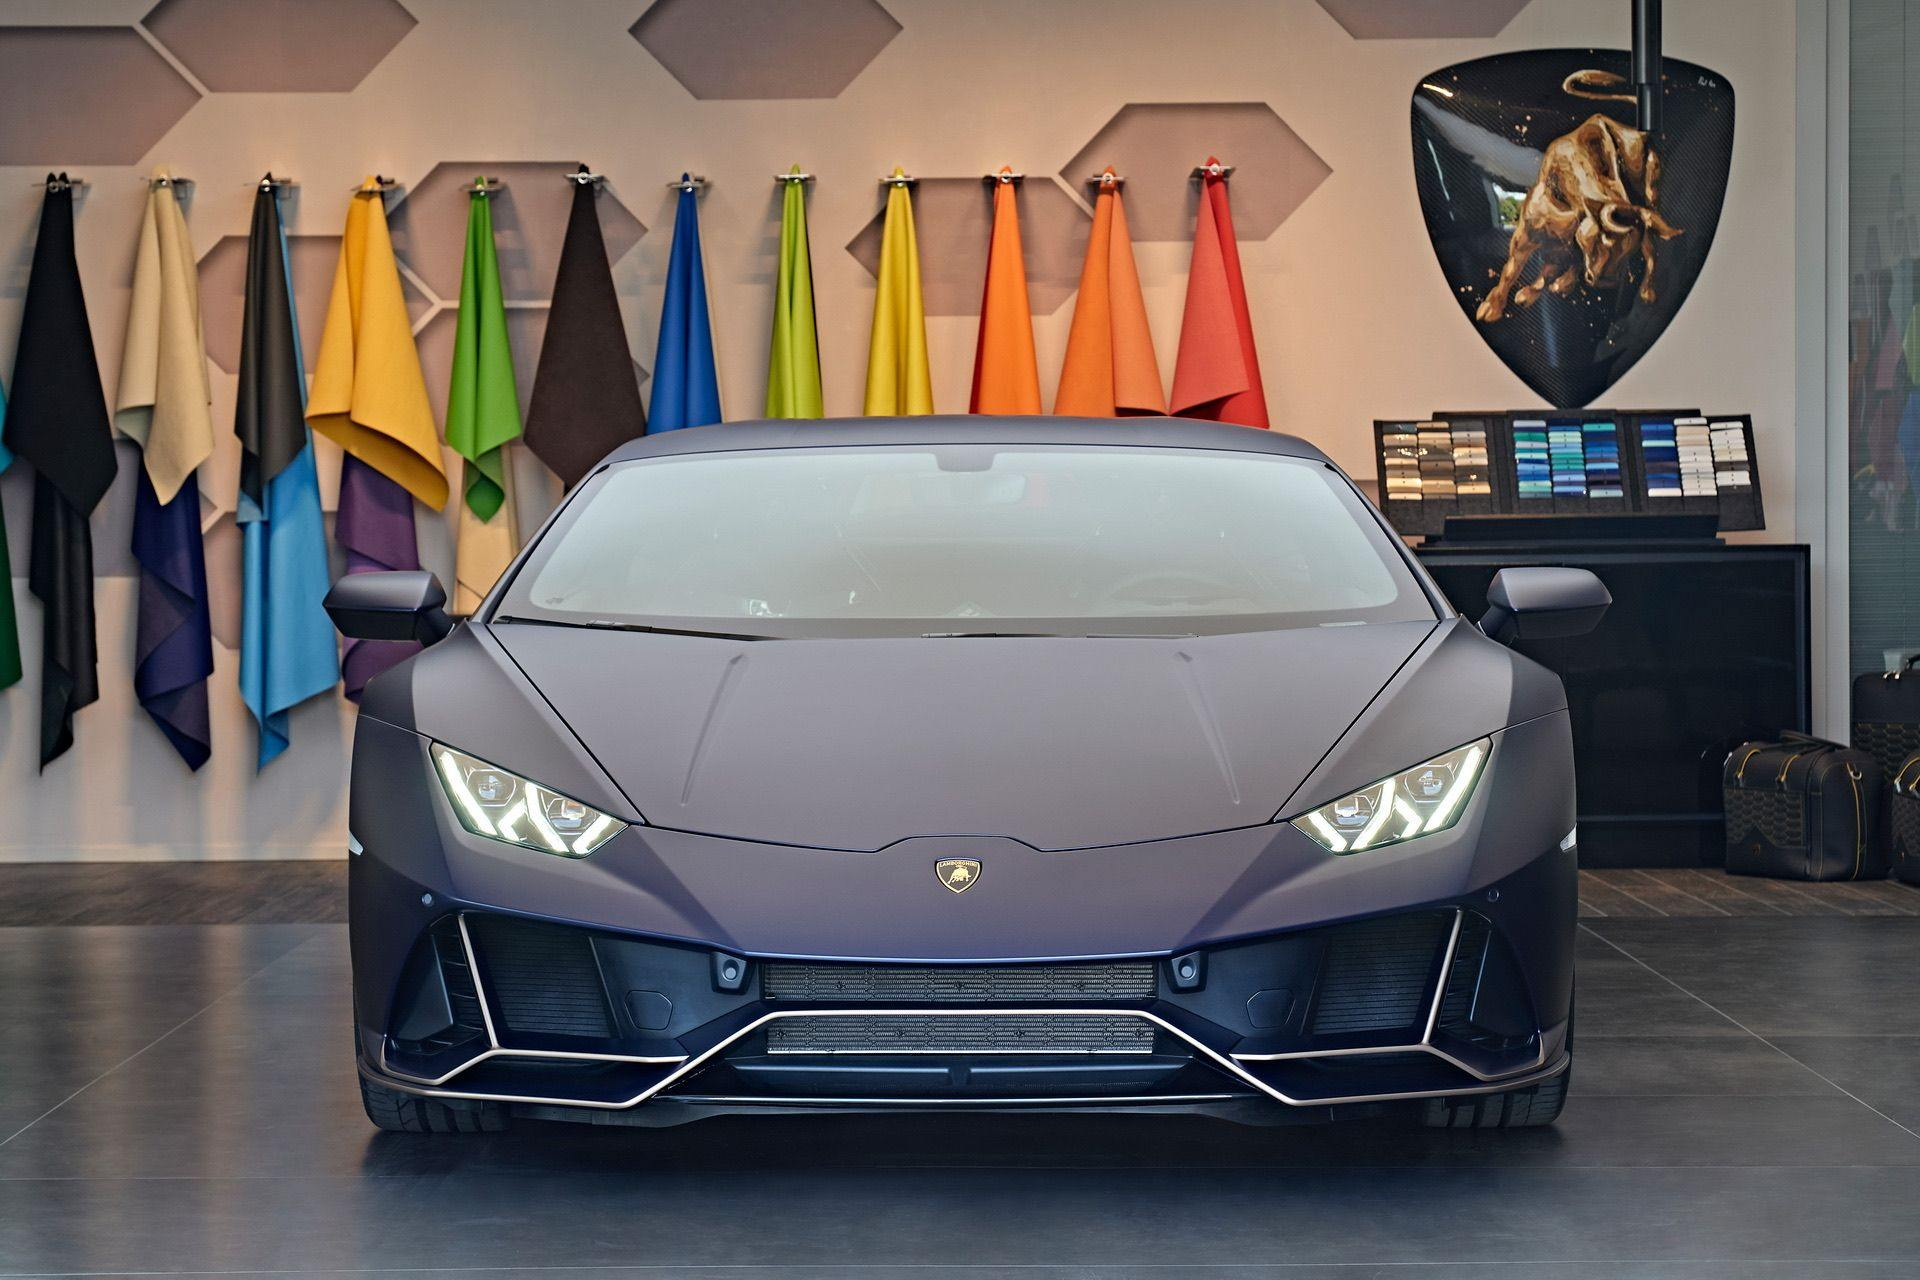 Lamborghini-Huracan-for-Mexico12_1920x1280